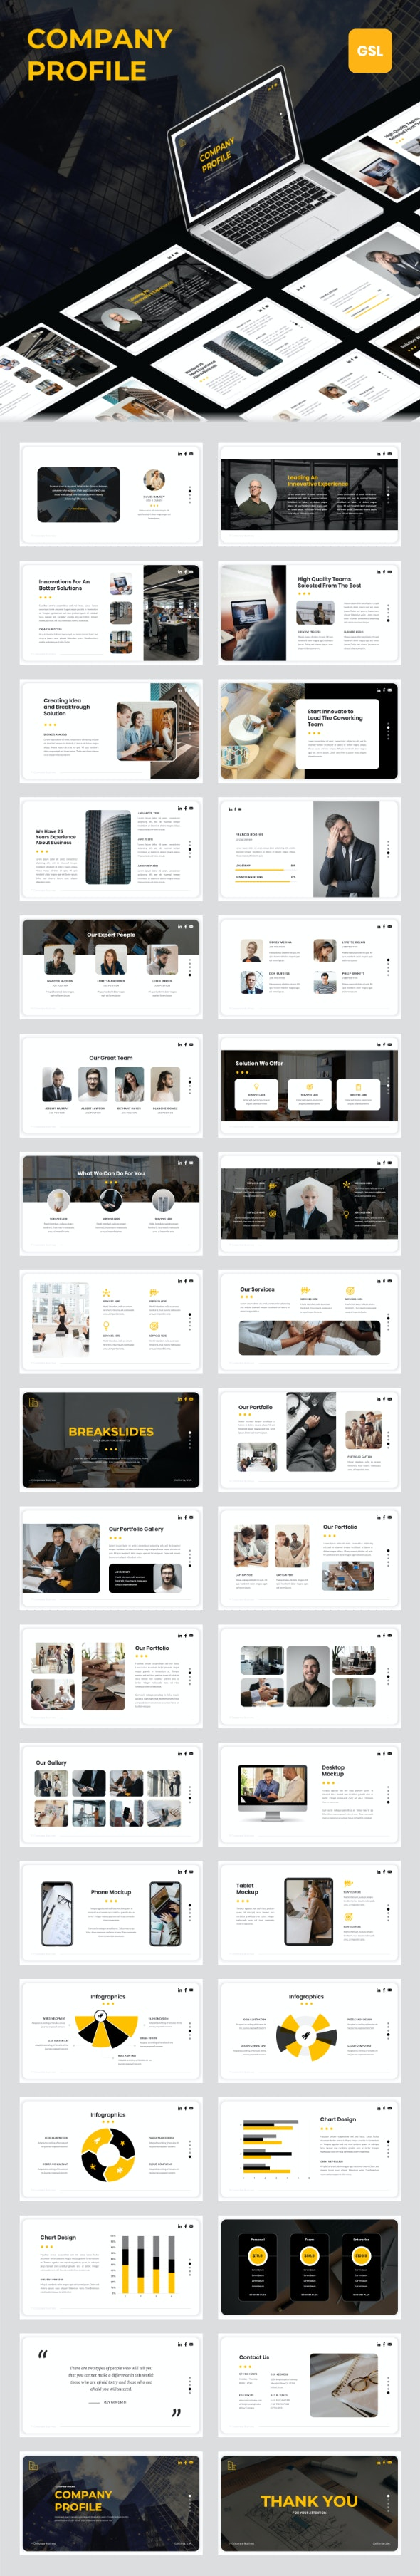 Company Profile - Google Slides Template - Google Slides Presentation Templates